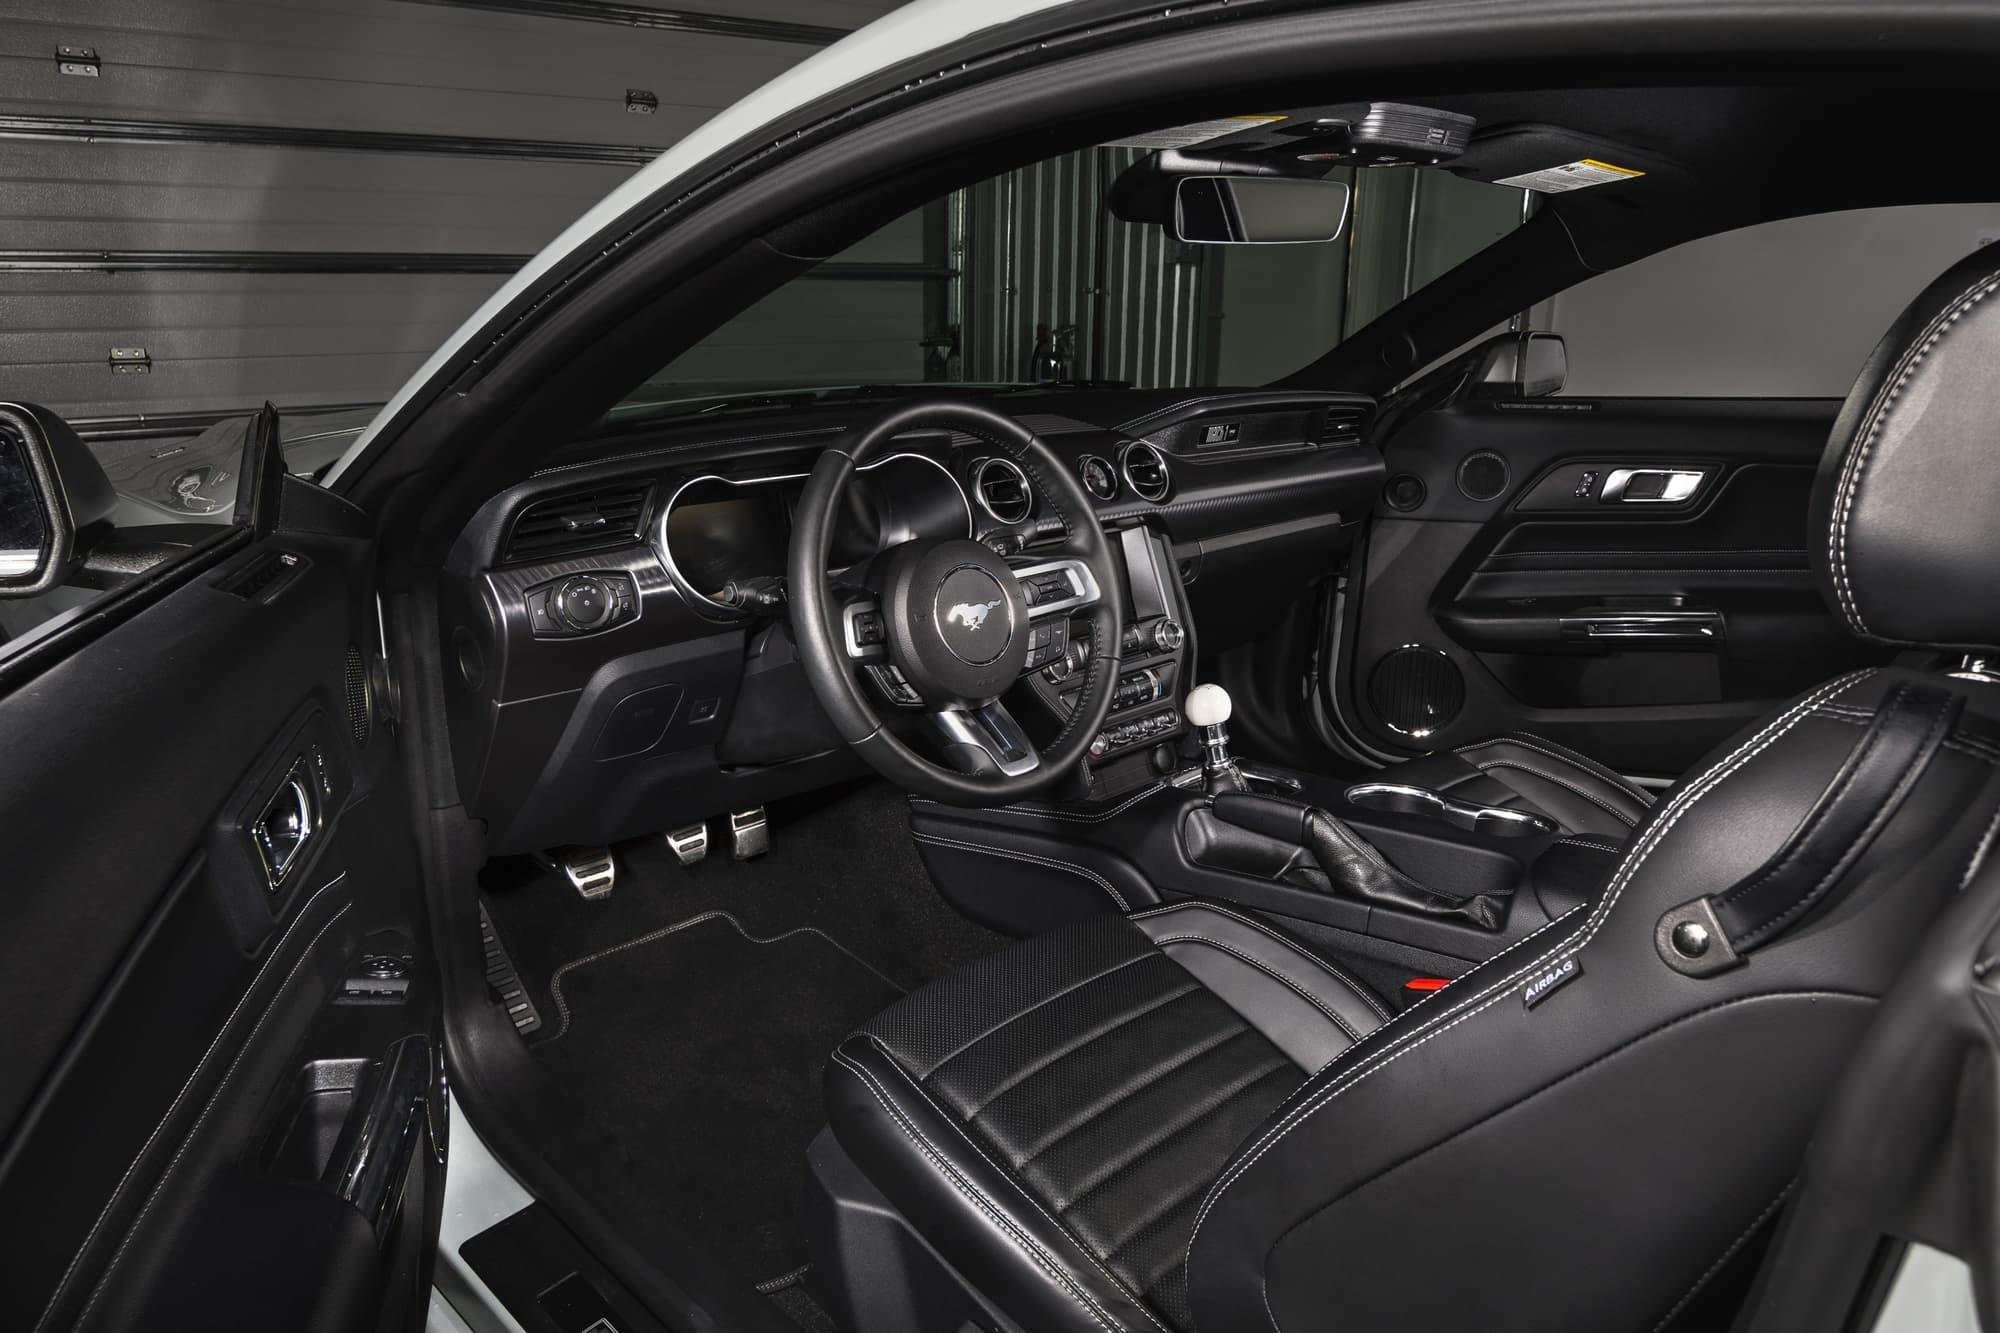 2021 Mustang Mach 1 interior